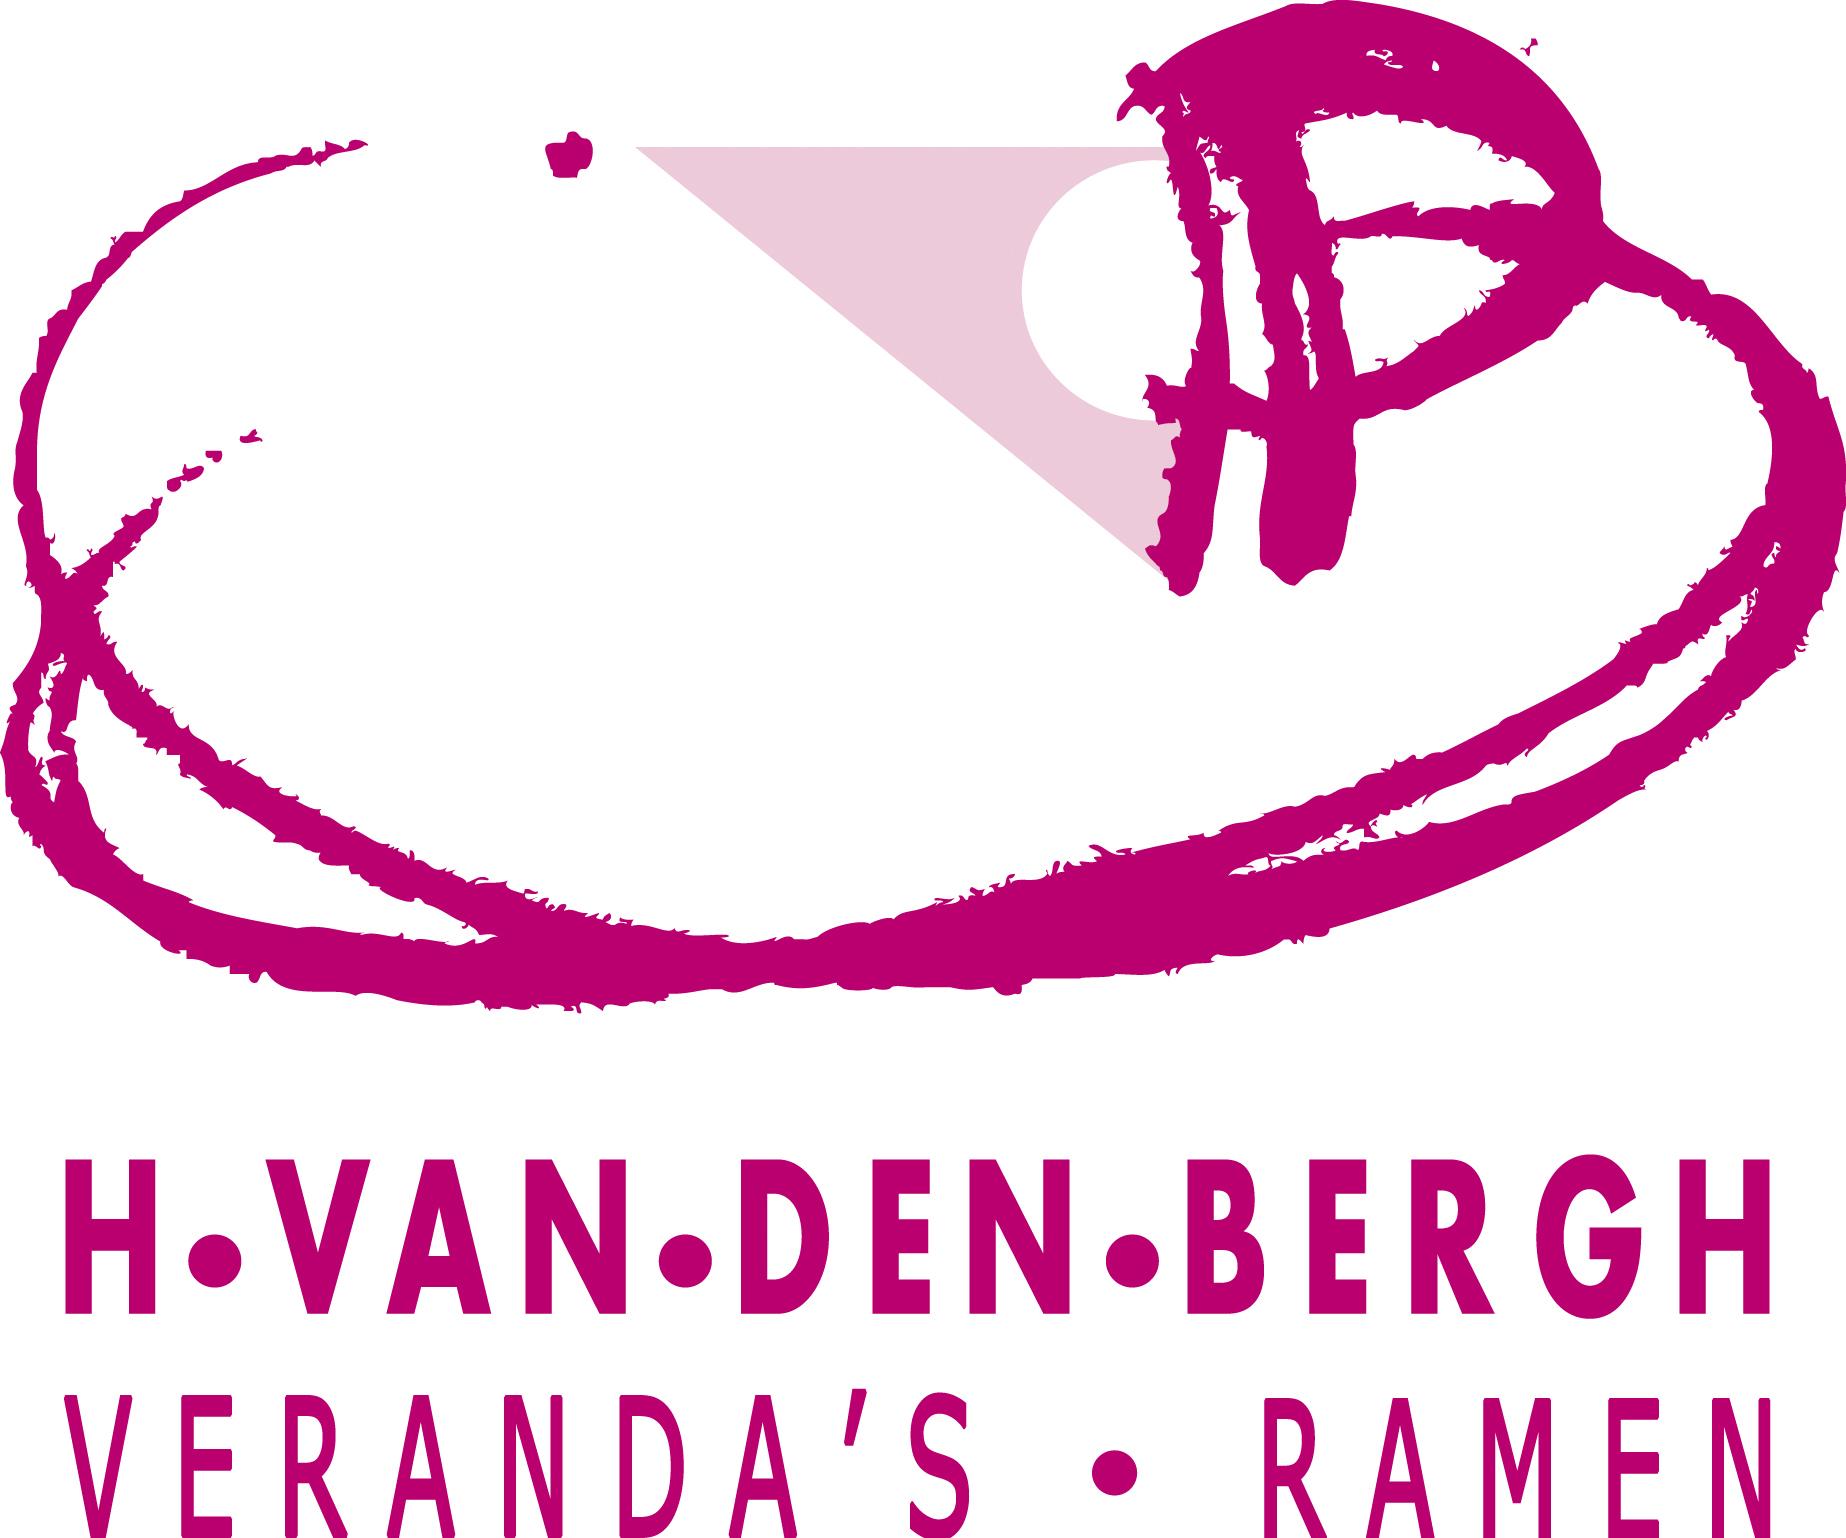 Van Den Bergh Verandas